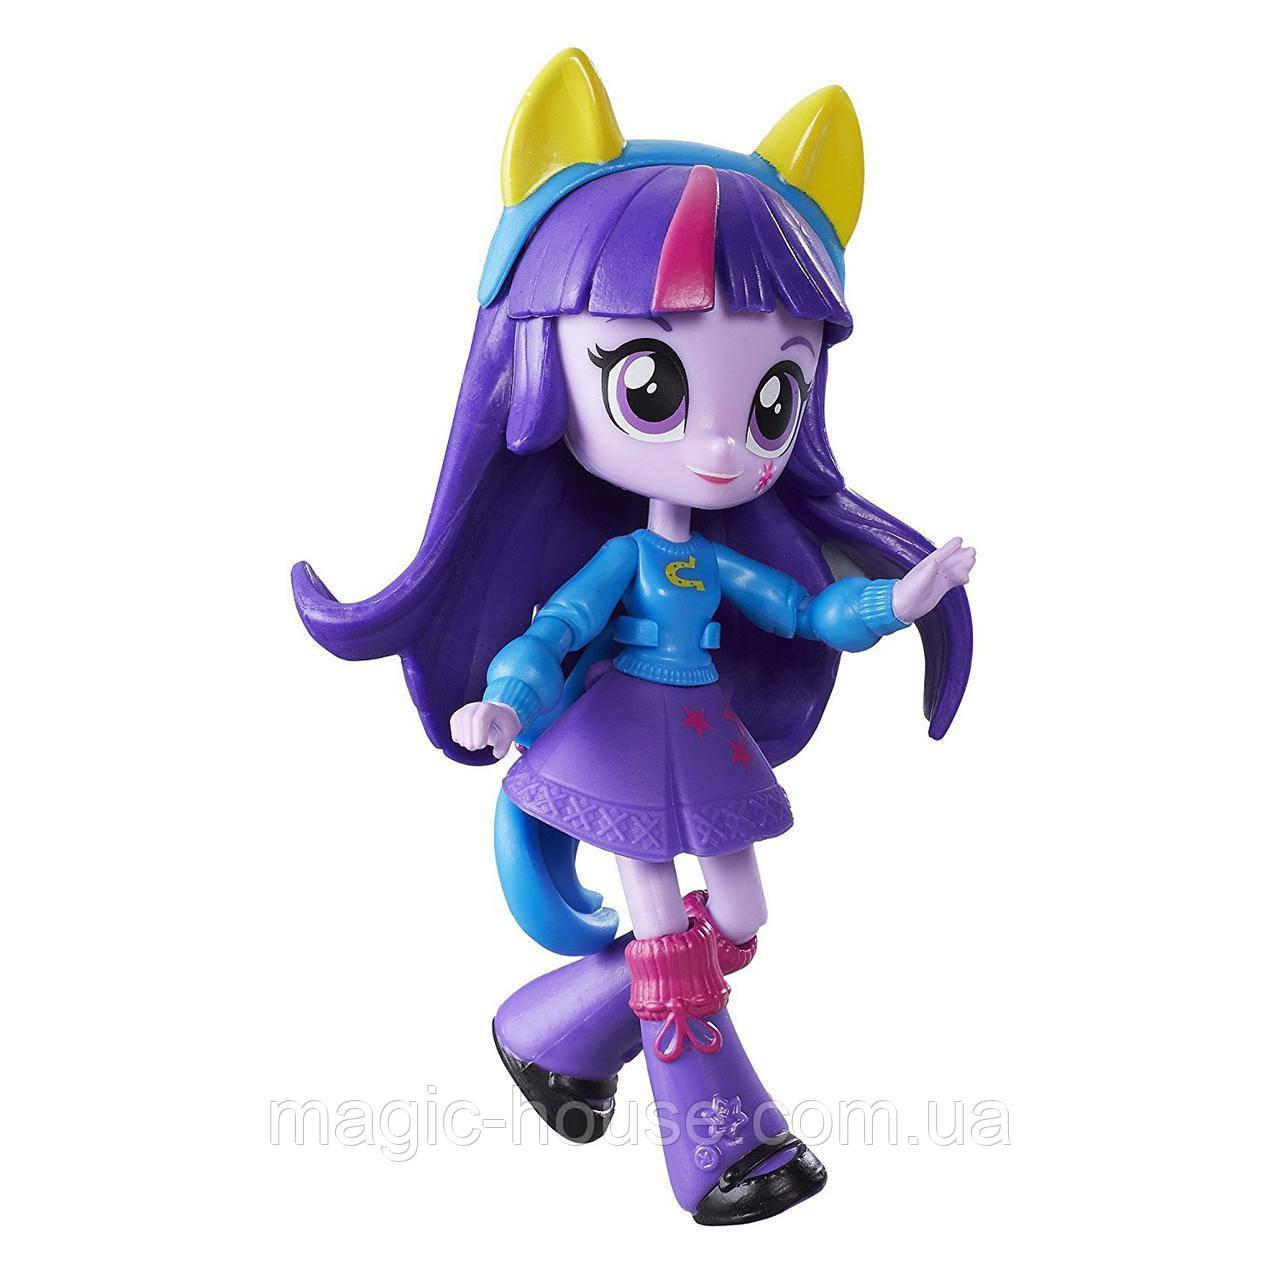 My Little PonyТвайлайт Спаркл мини девочки Эквестрии Equestria Girls MinisTwilight SparkleRock